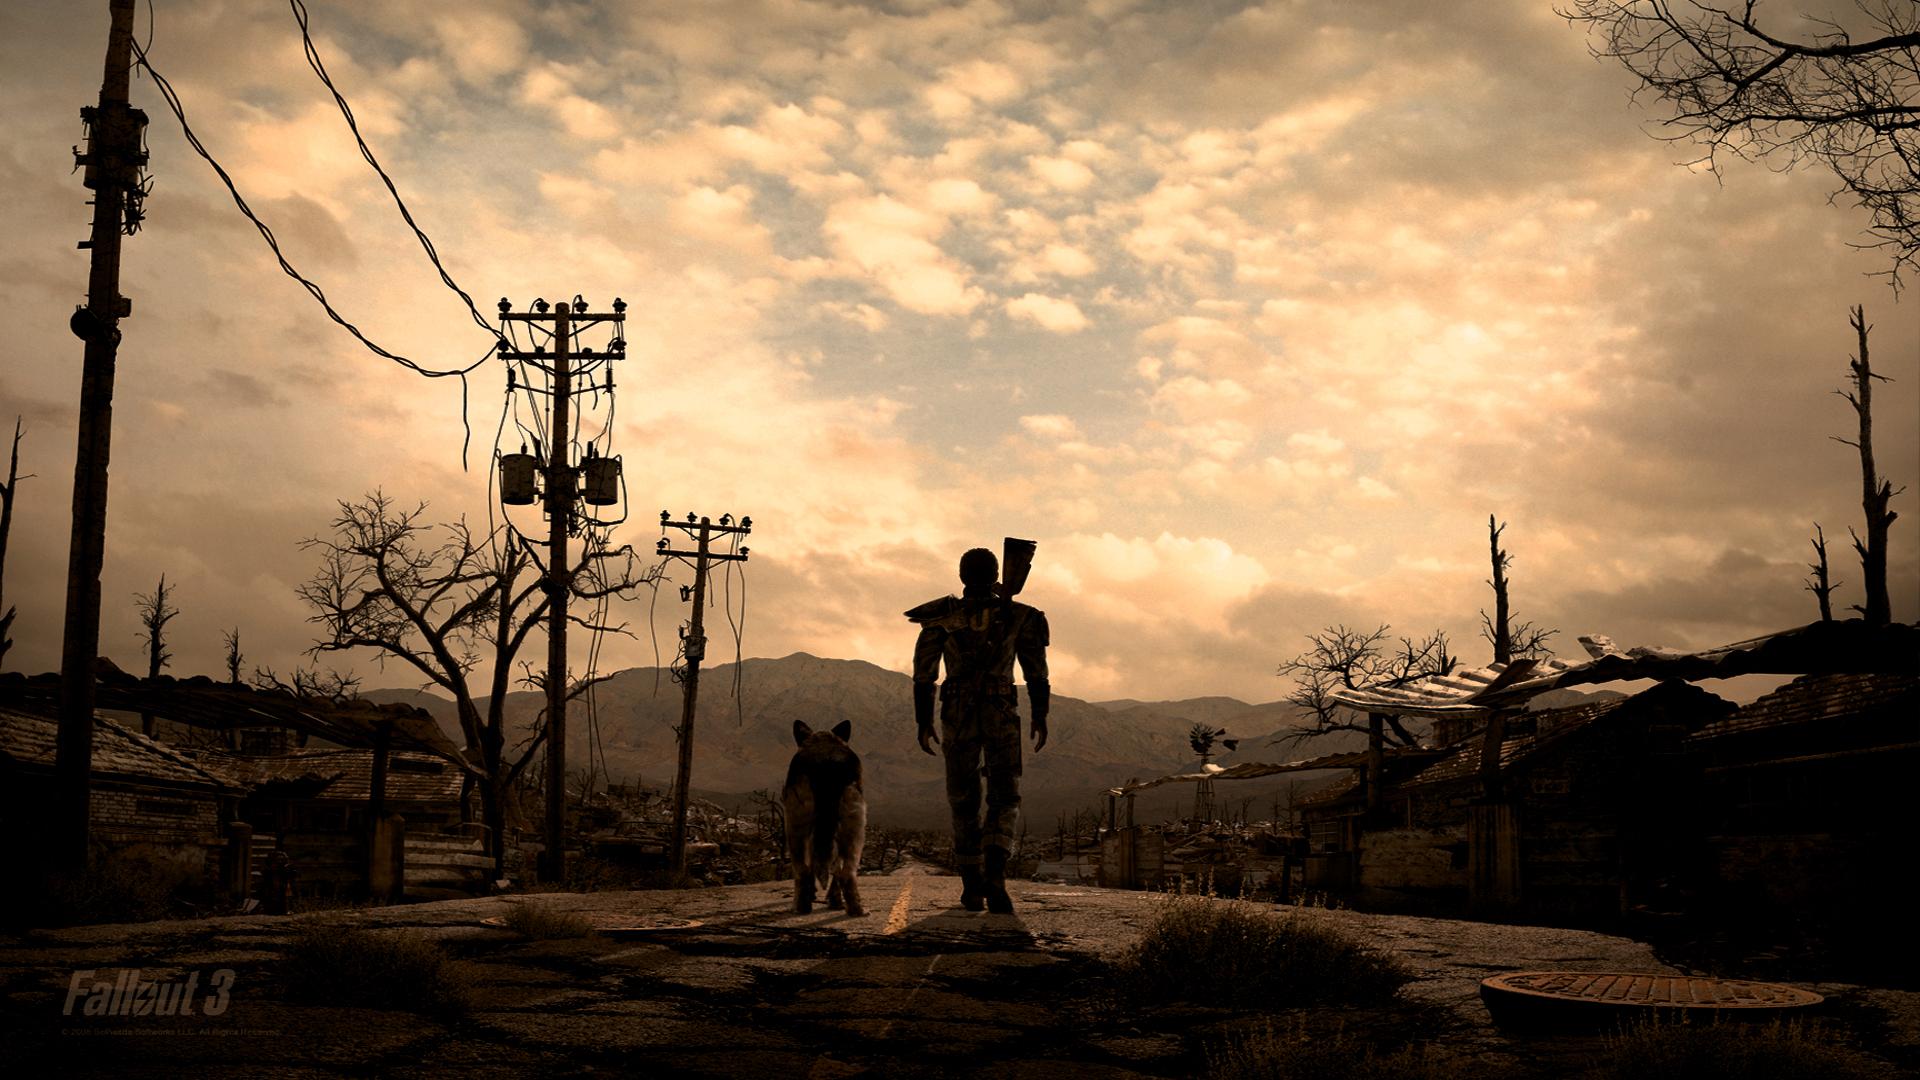 Download Wallpaper x Fallout Super mutant Behemoth Mac